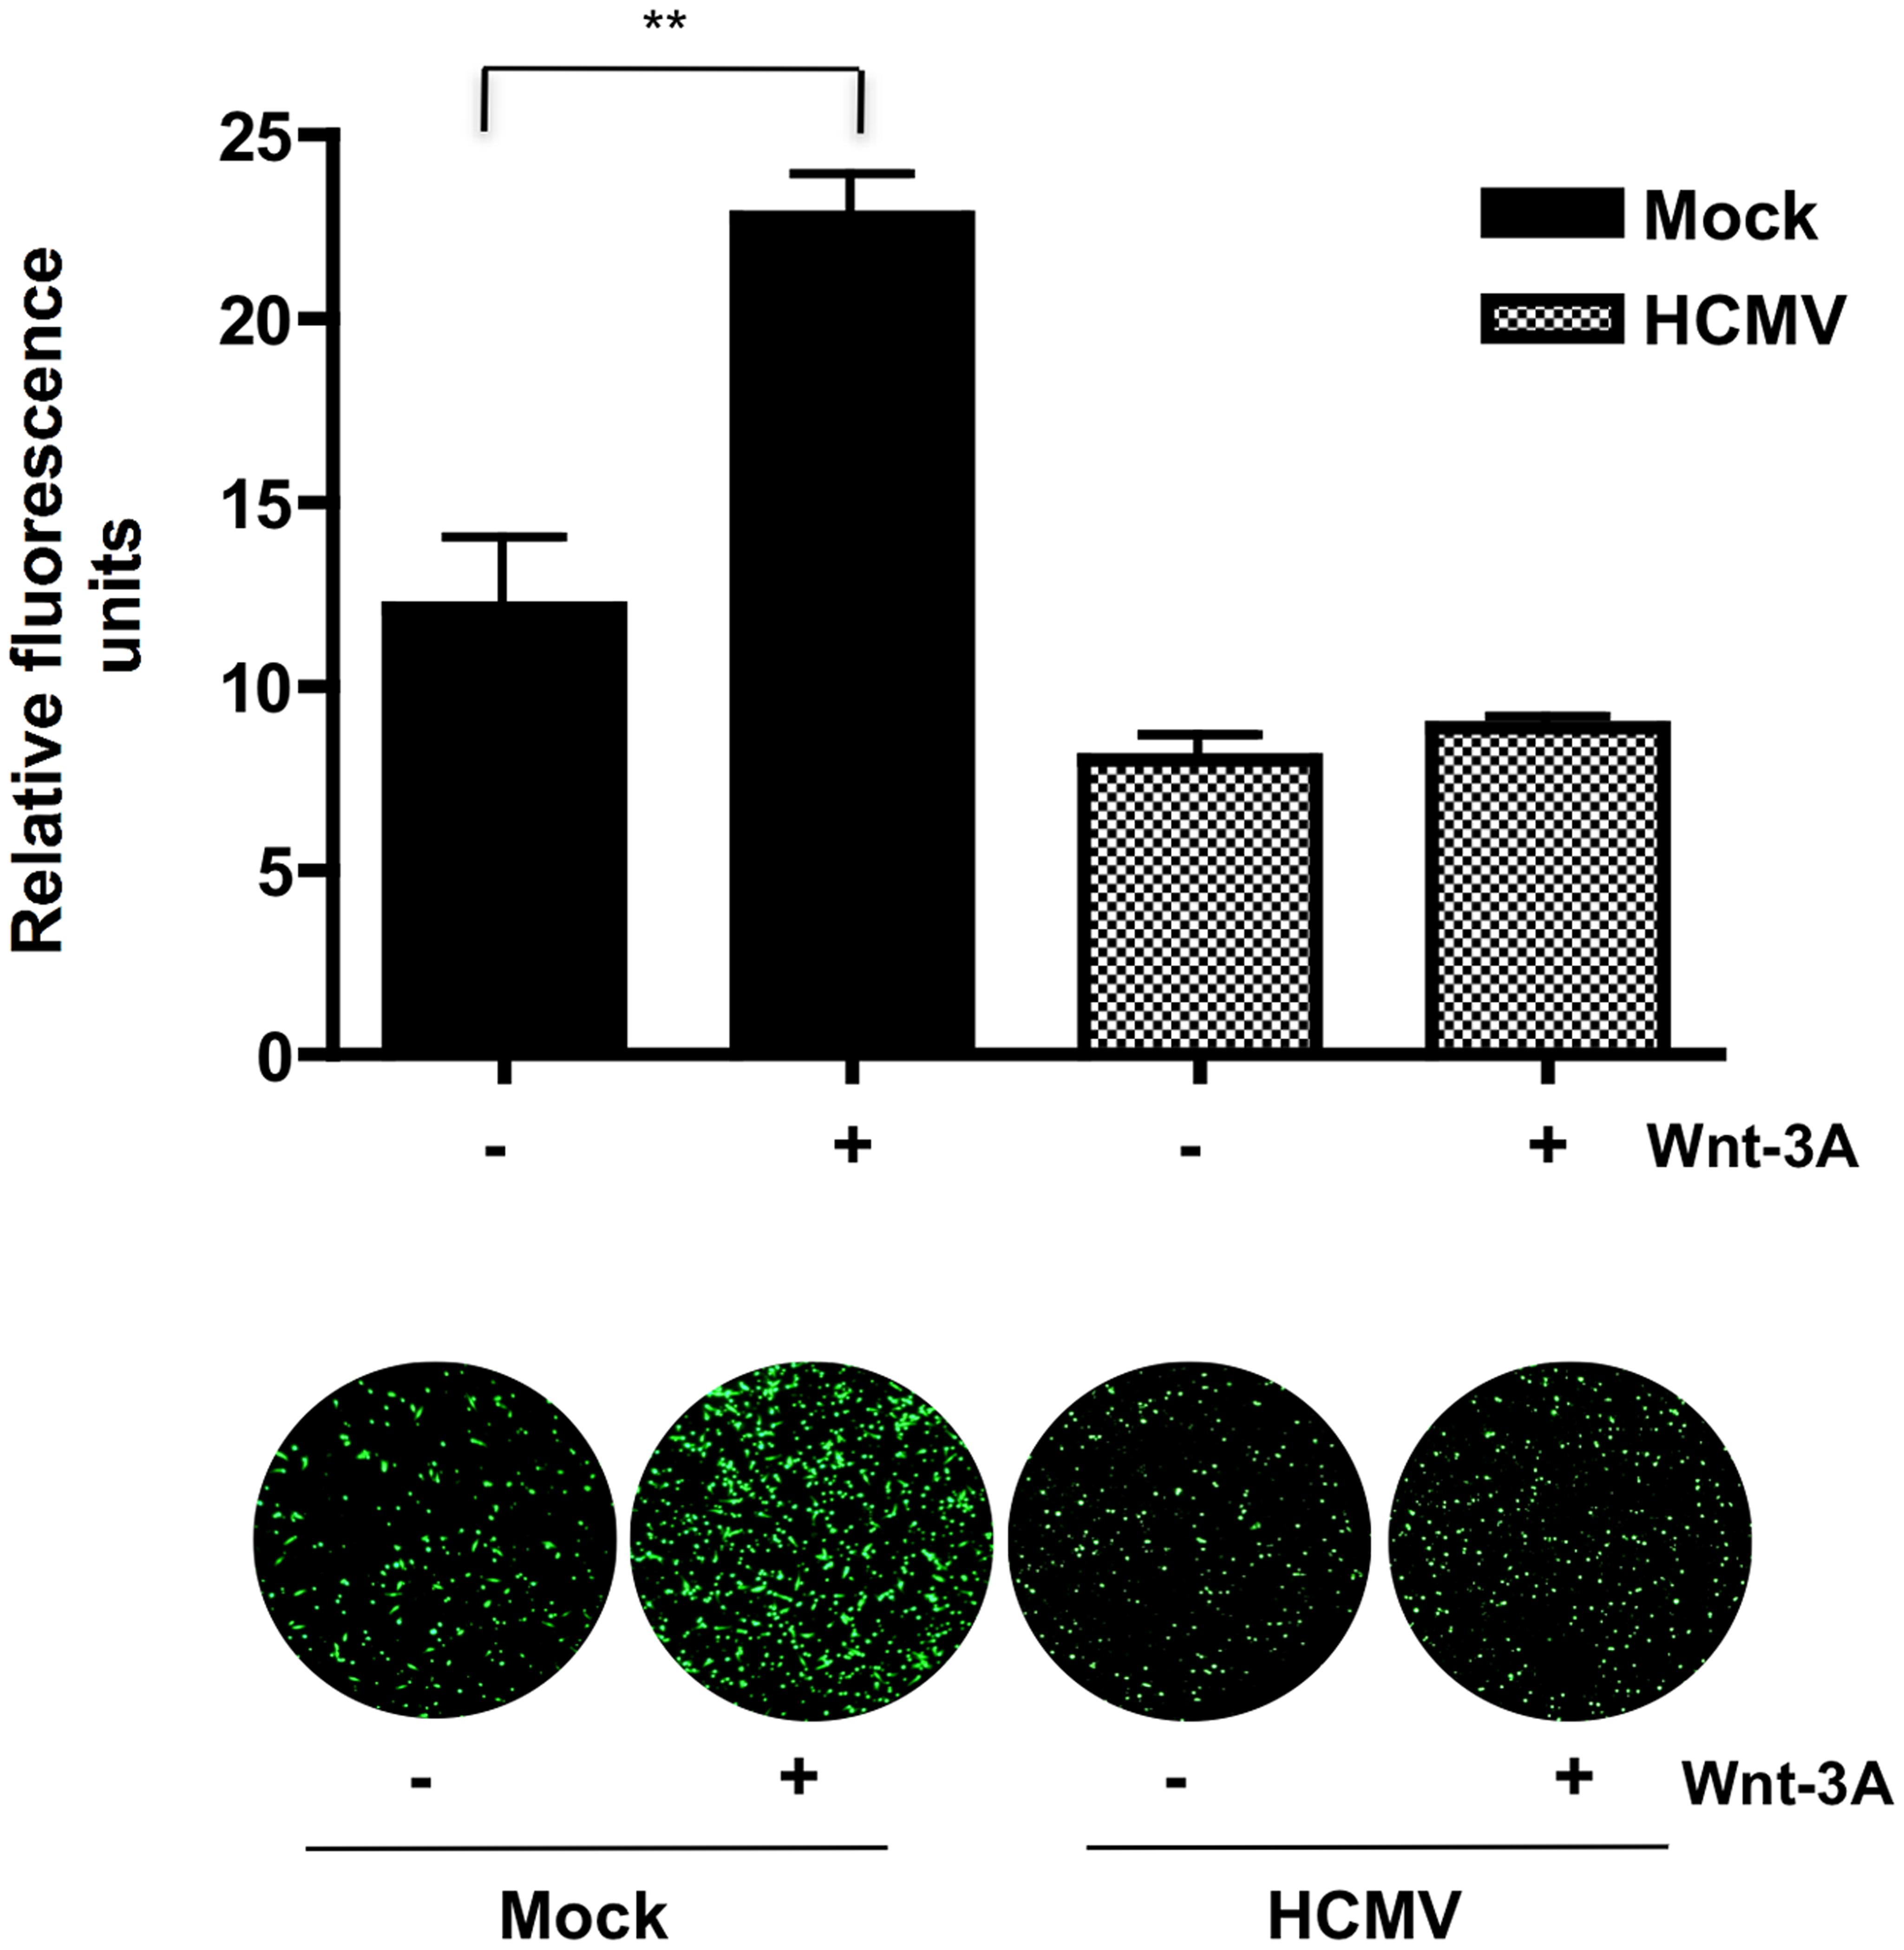 HCMV inhibits Wnt-3A-induced migration of SGHPL-4 EVTs.